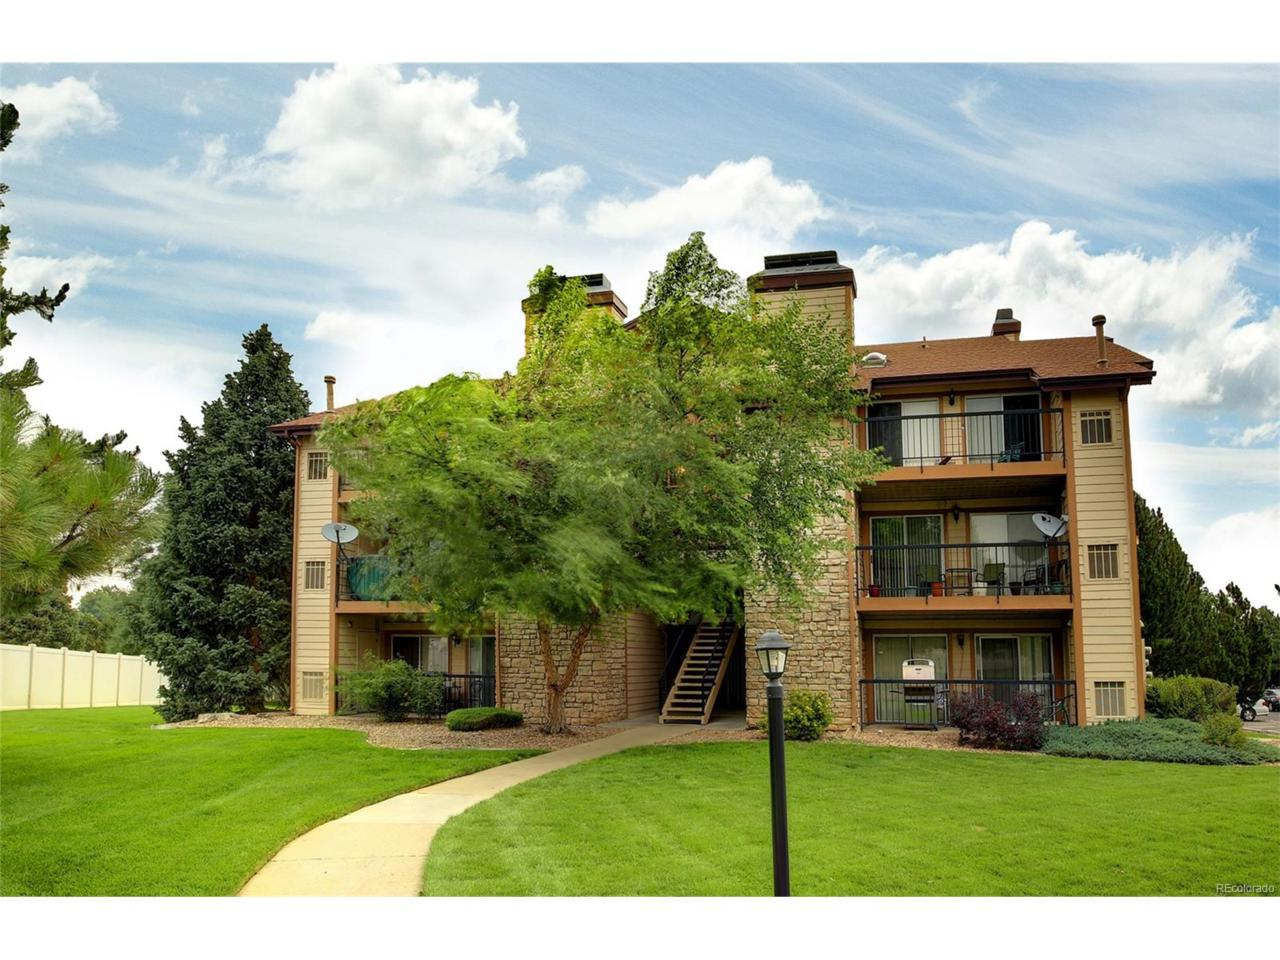 2575 S Syracuse Way K106, Denver, CO 80231 (MLS #9418336) :: 8z Real Estate